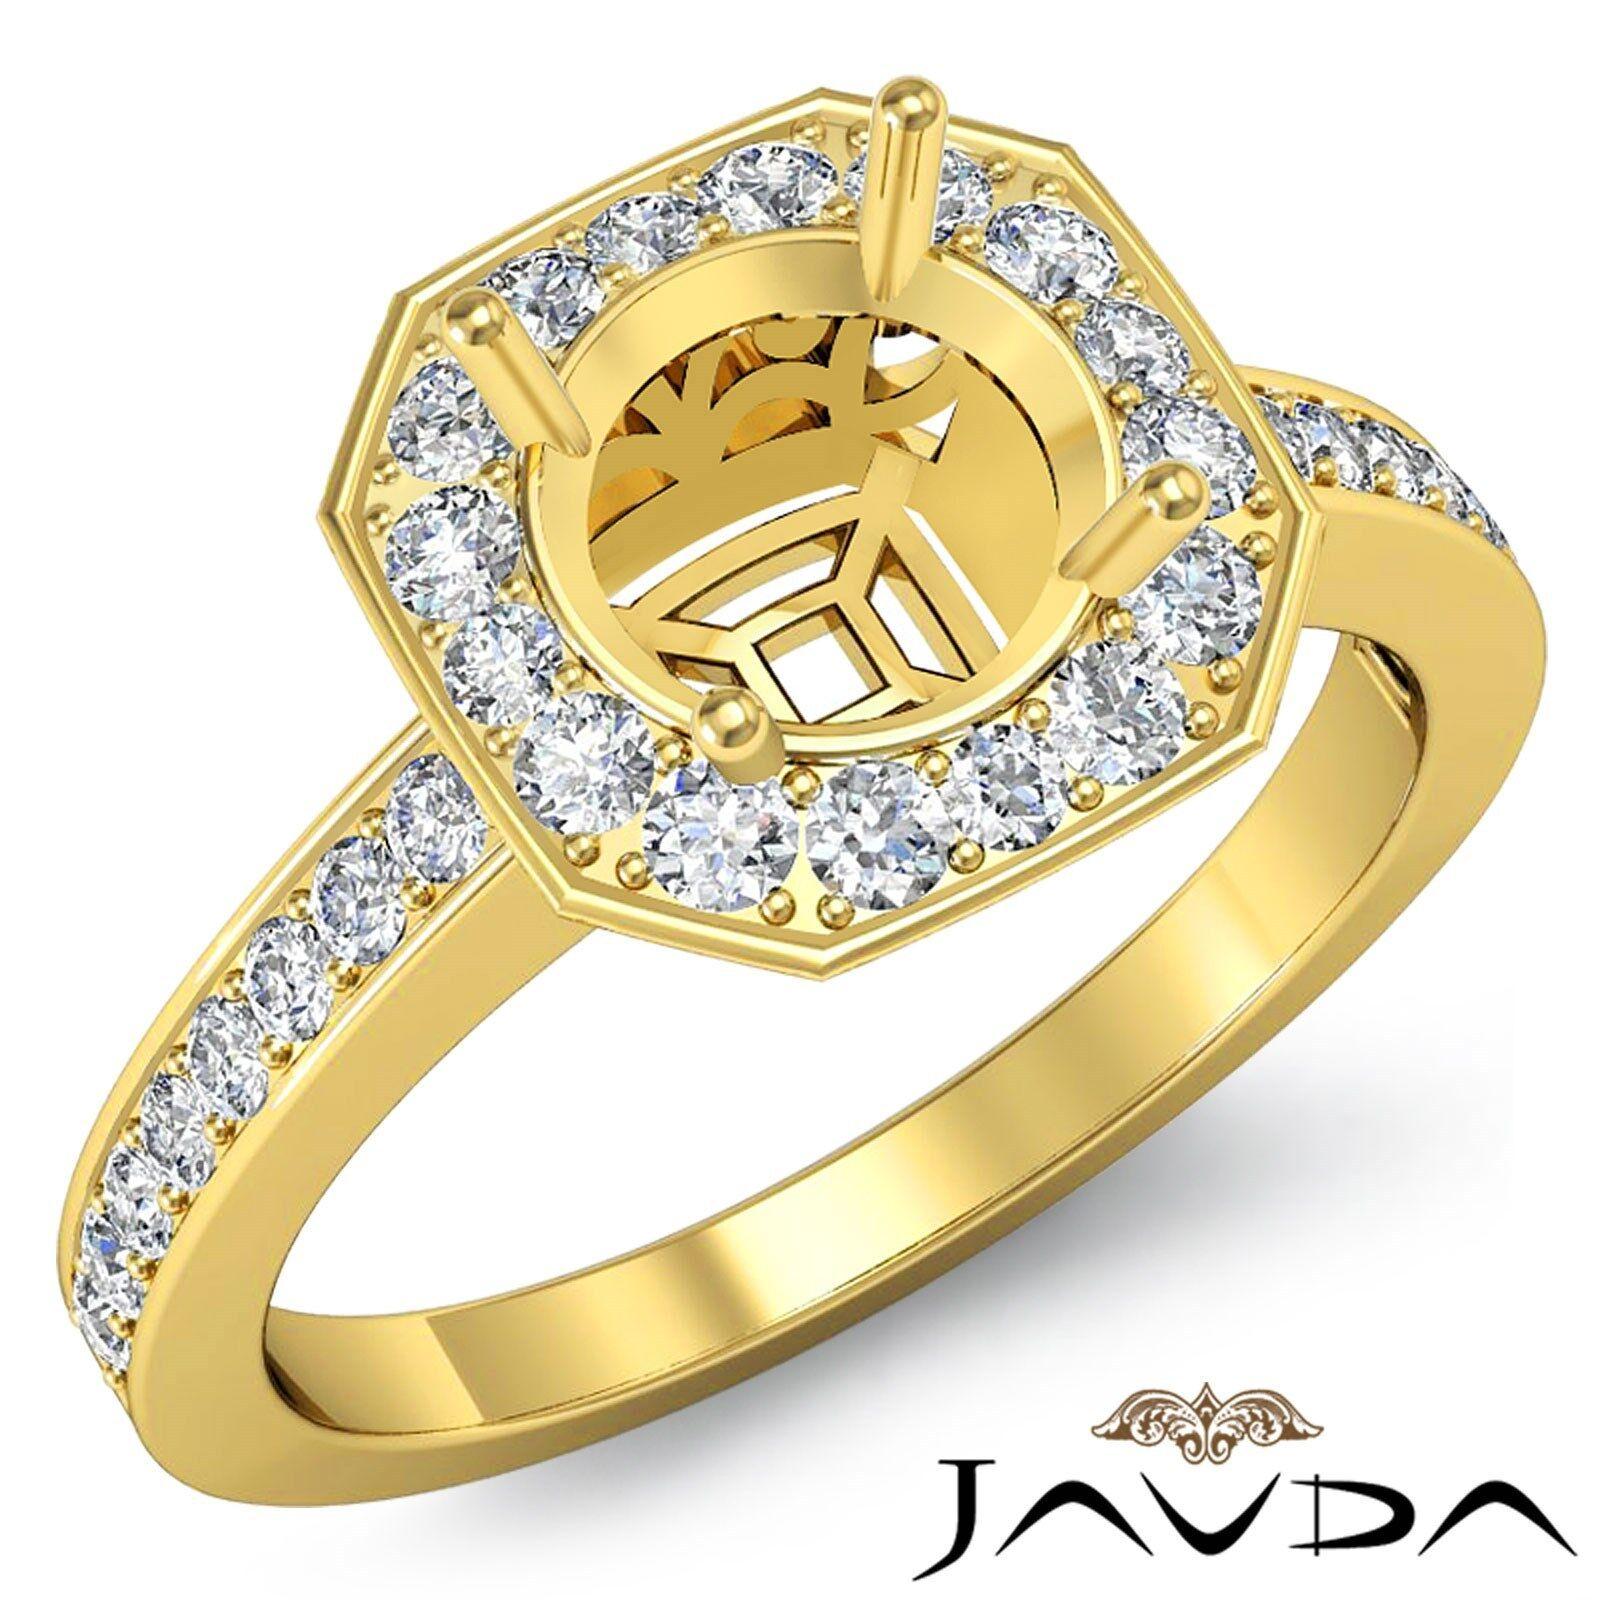 Halo Pave Set Round 0.37Ct Diamond Engagement Semi Mount Ring 18k Yellow gold